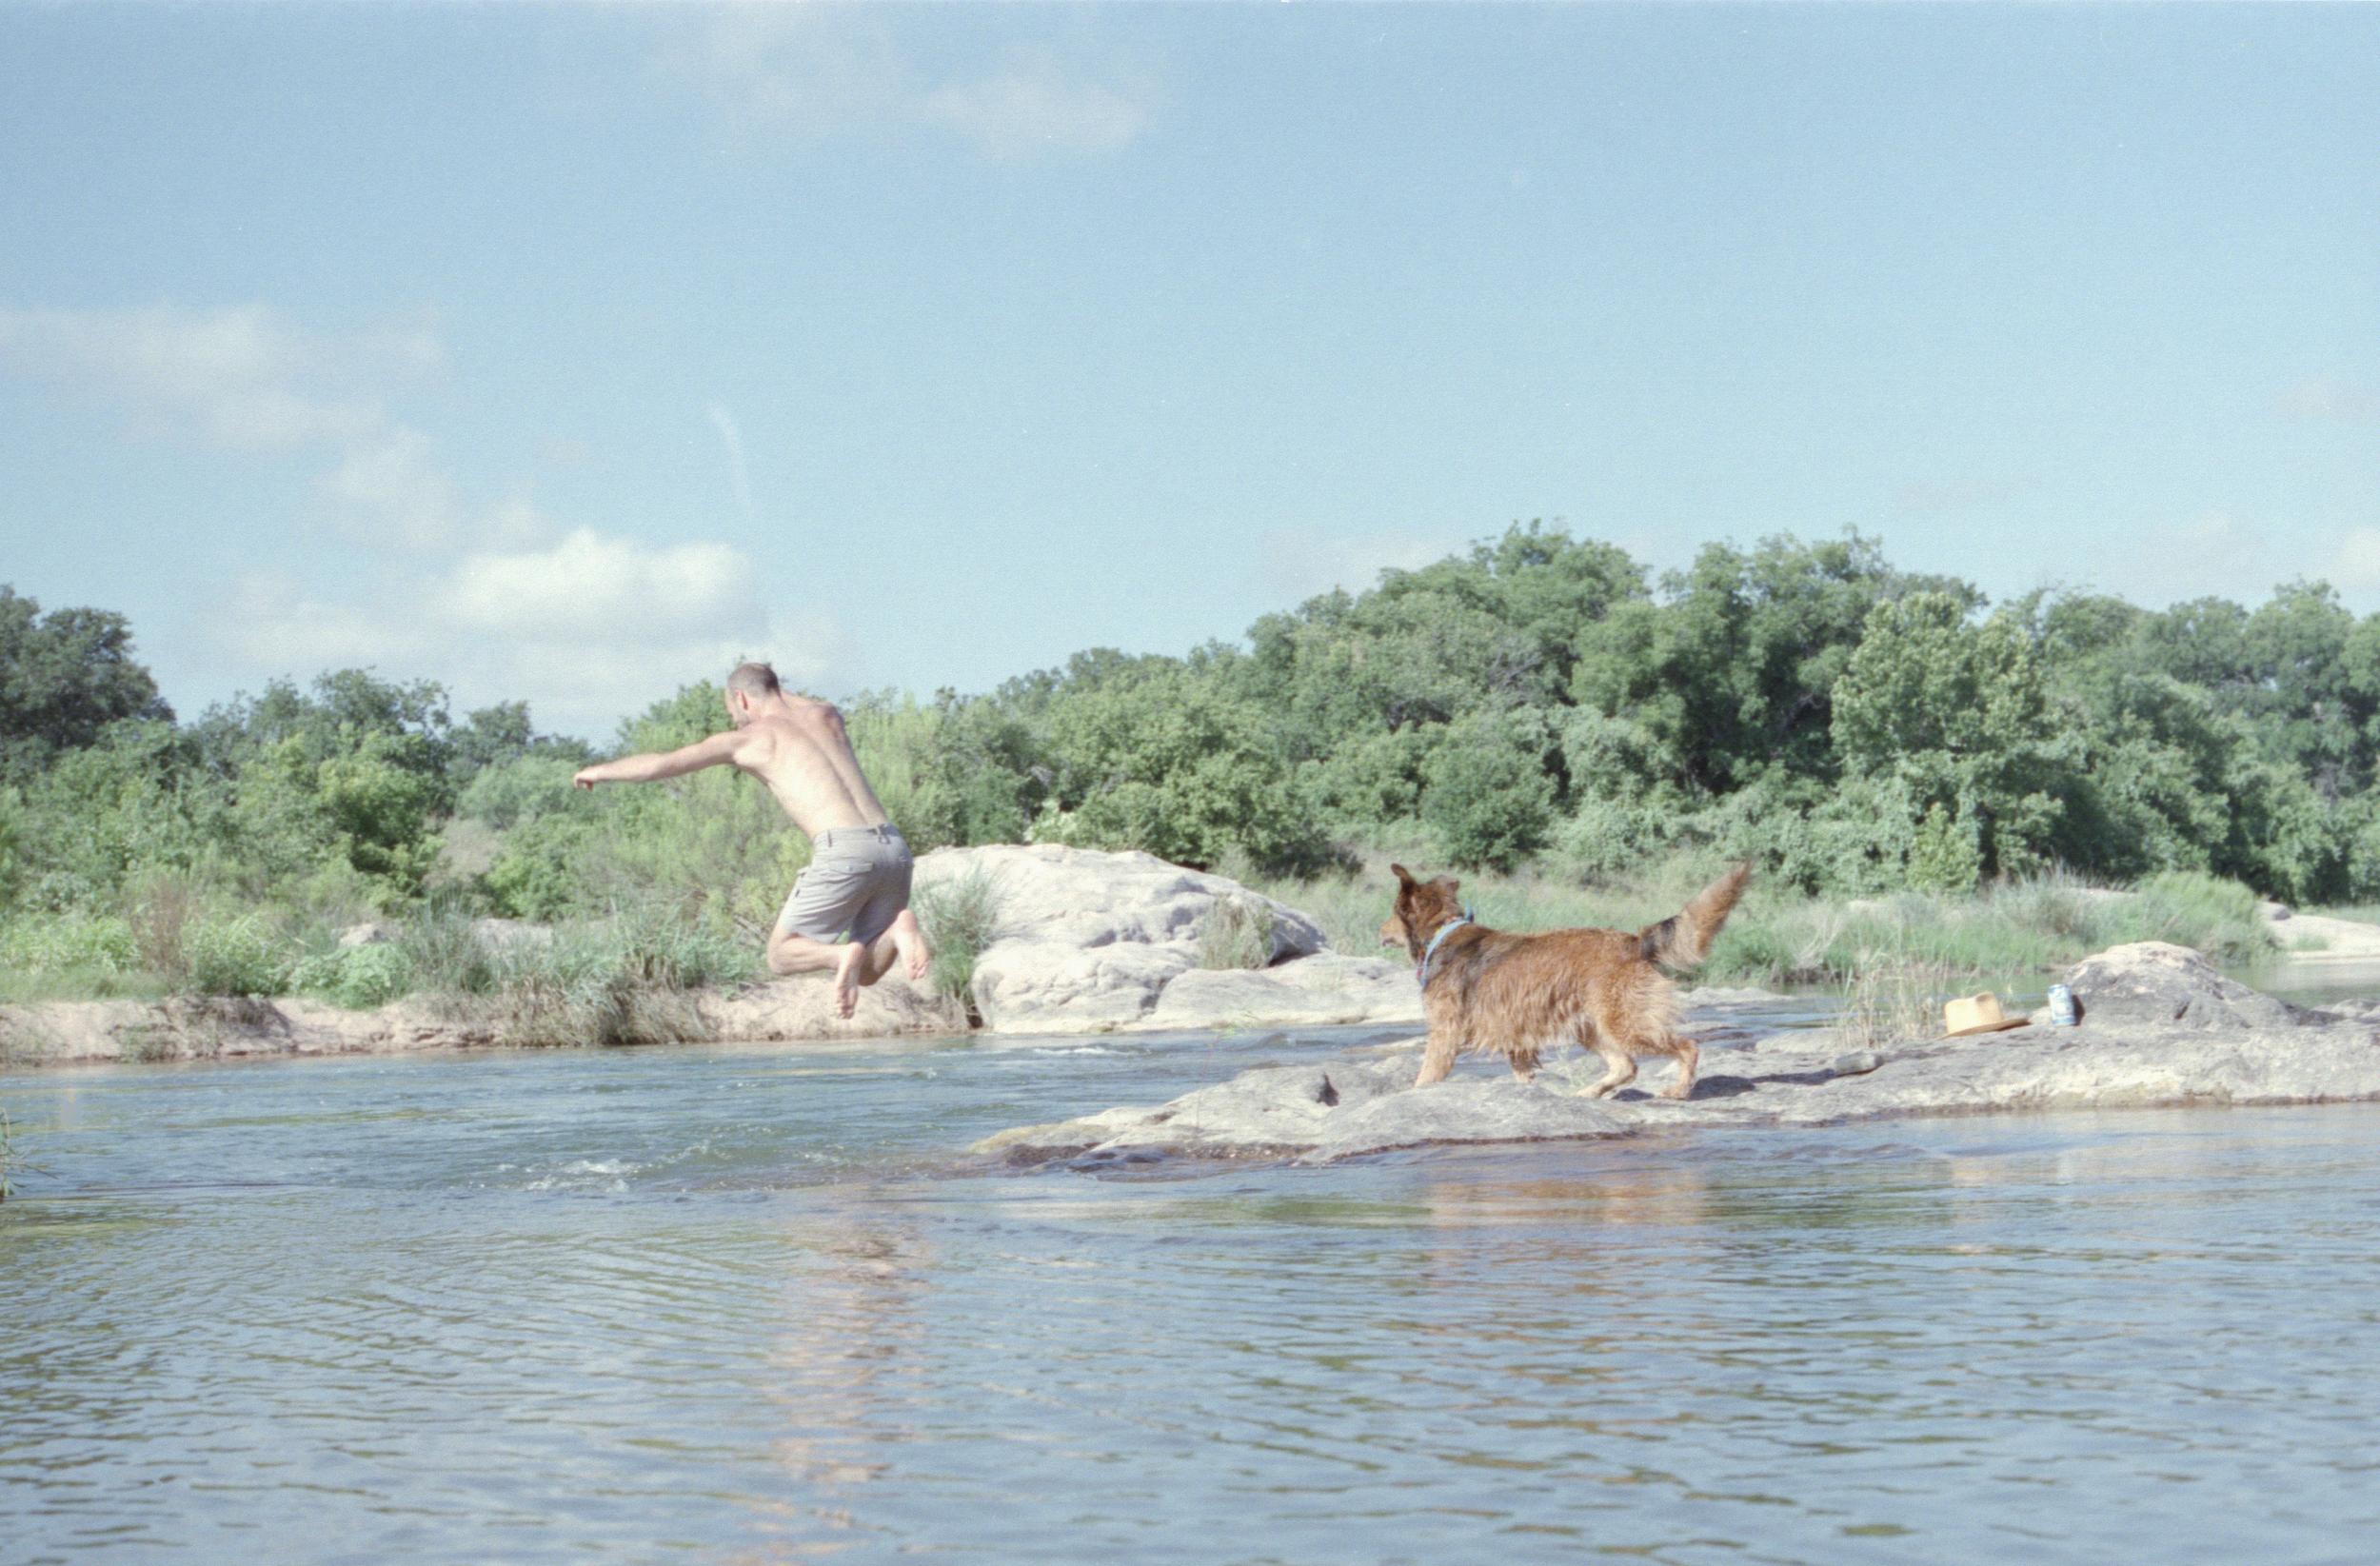 llano river swimming texas swim camping dog water 35mm